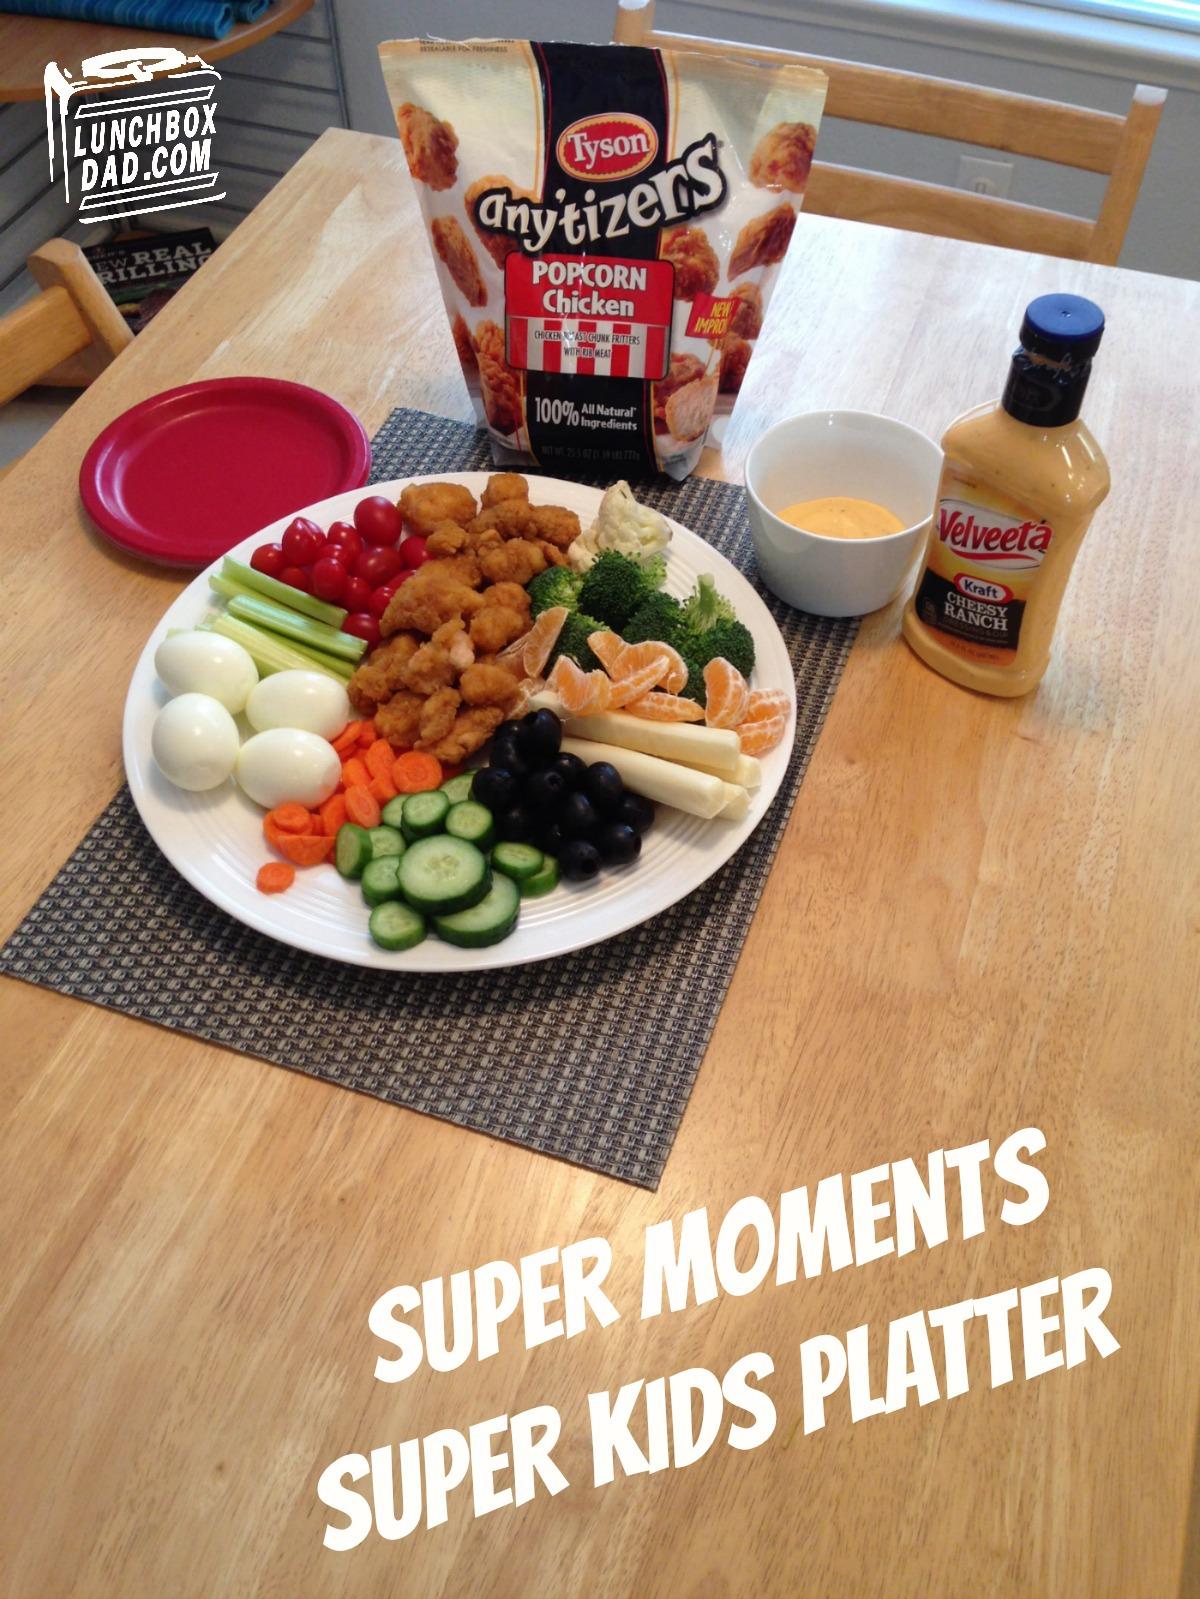 Tyson Super Moments Super Kids Platter #SuperMoments #ad #cbias